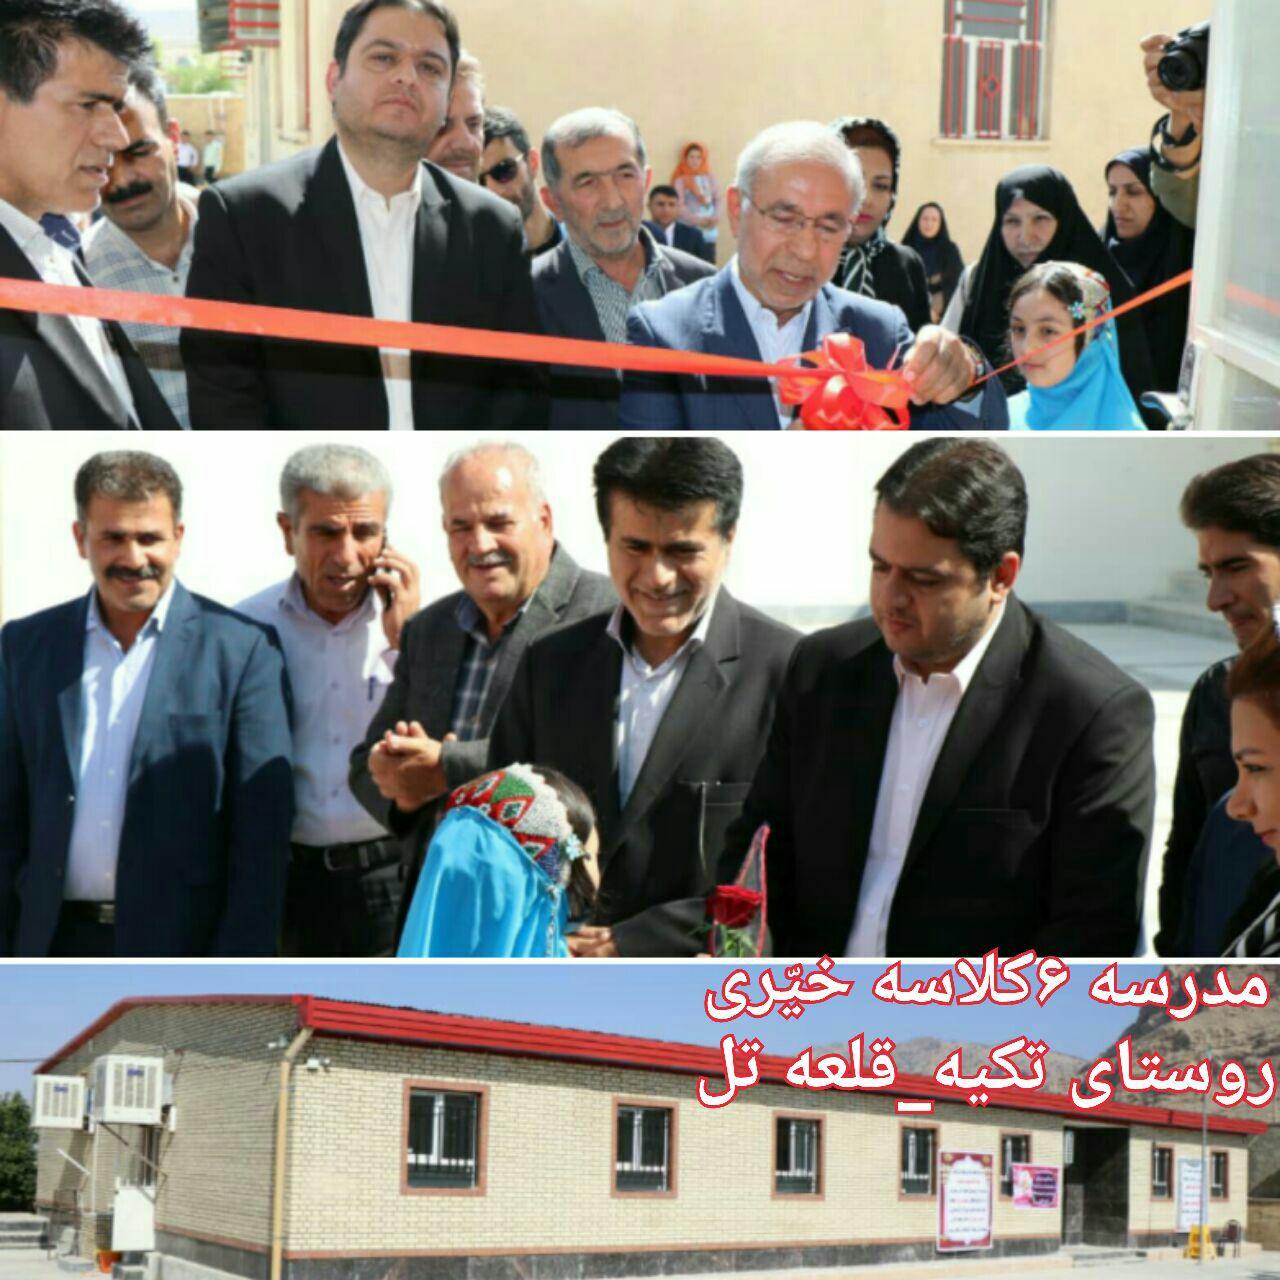 IMG 20190925 104700 128 1 ۱۰ کلاس جدید به ظرفیت مدارس قلعه تل باغملک افزوده شد